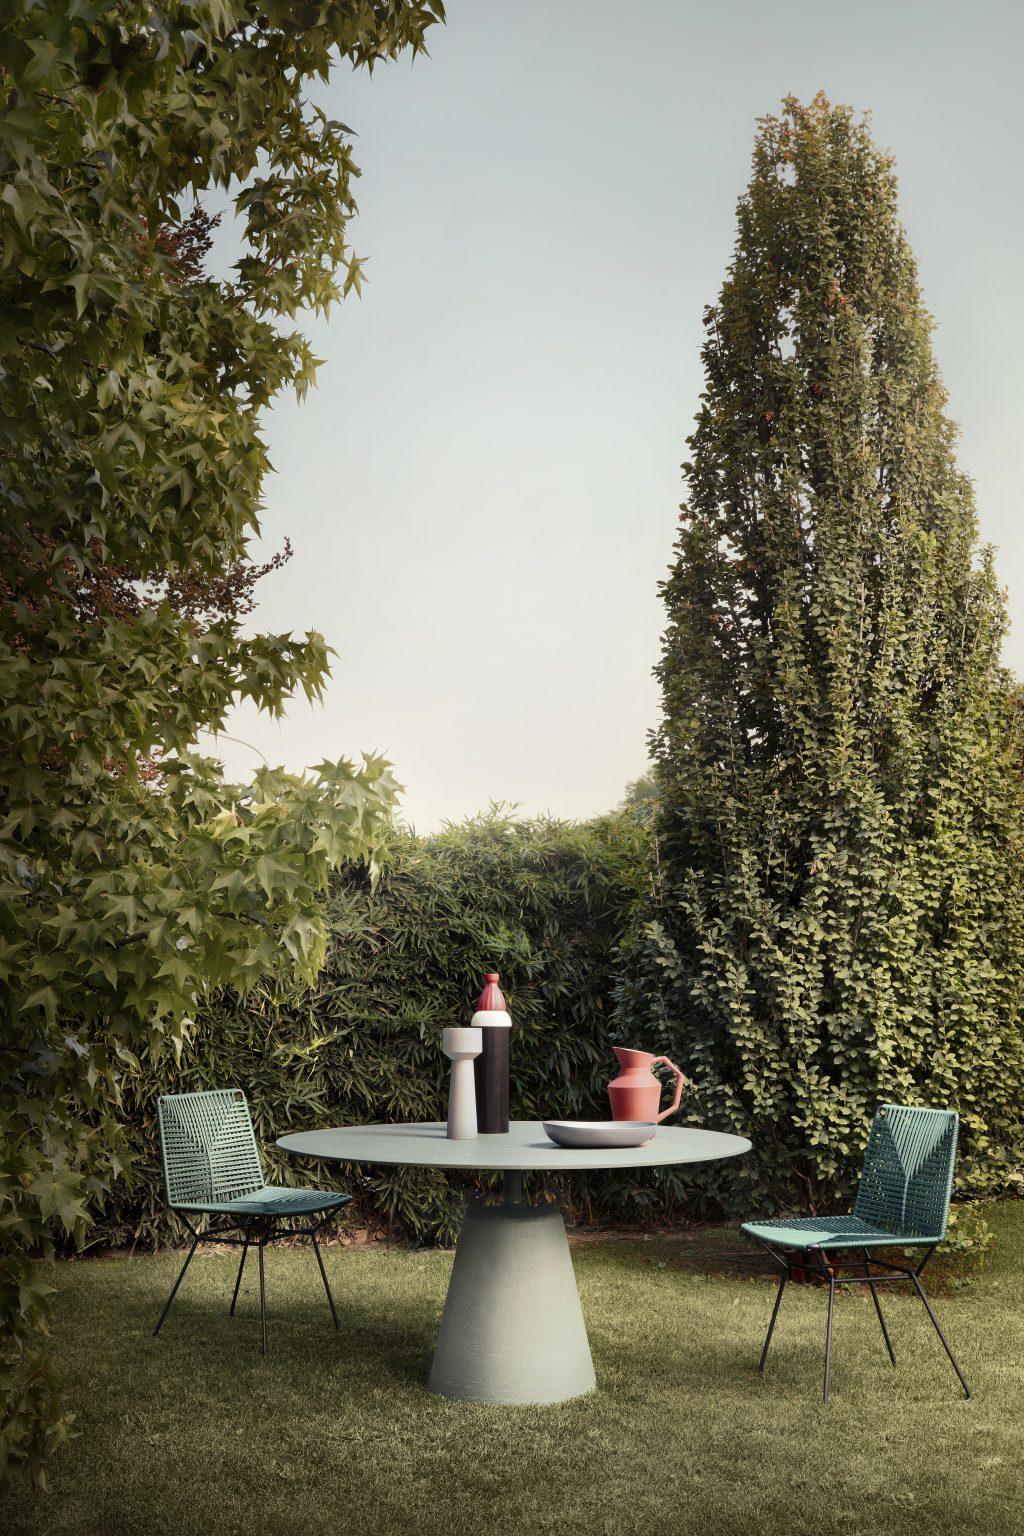 Biennale Interieur - Belgium's leading design and interior event - Neil-twist-2.jpg